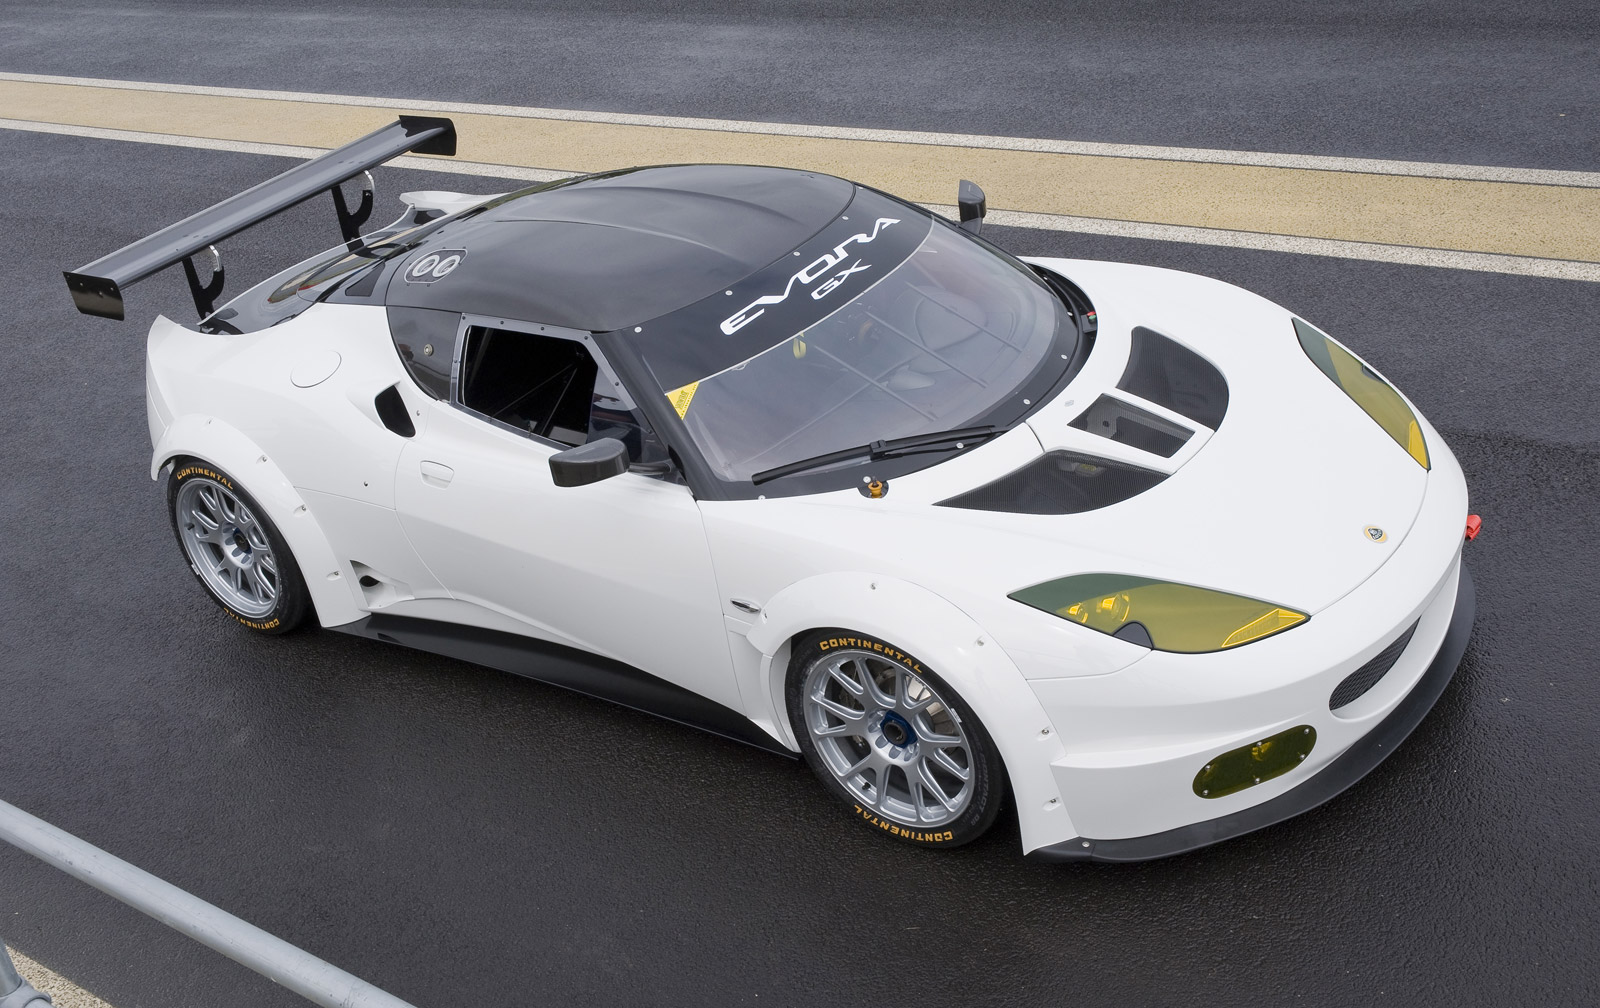 https://images.hgmsites.net/hug/2012-lotus-evora-gx-grand-am-race-car_100397047_h.jpg